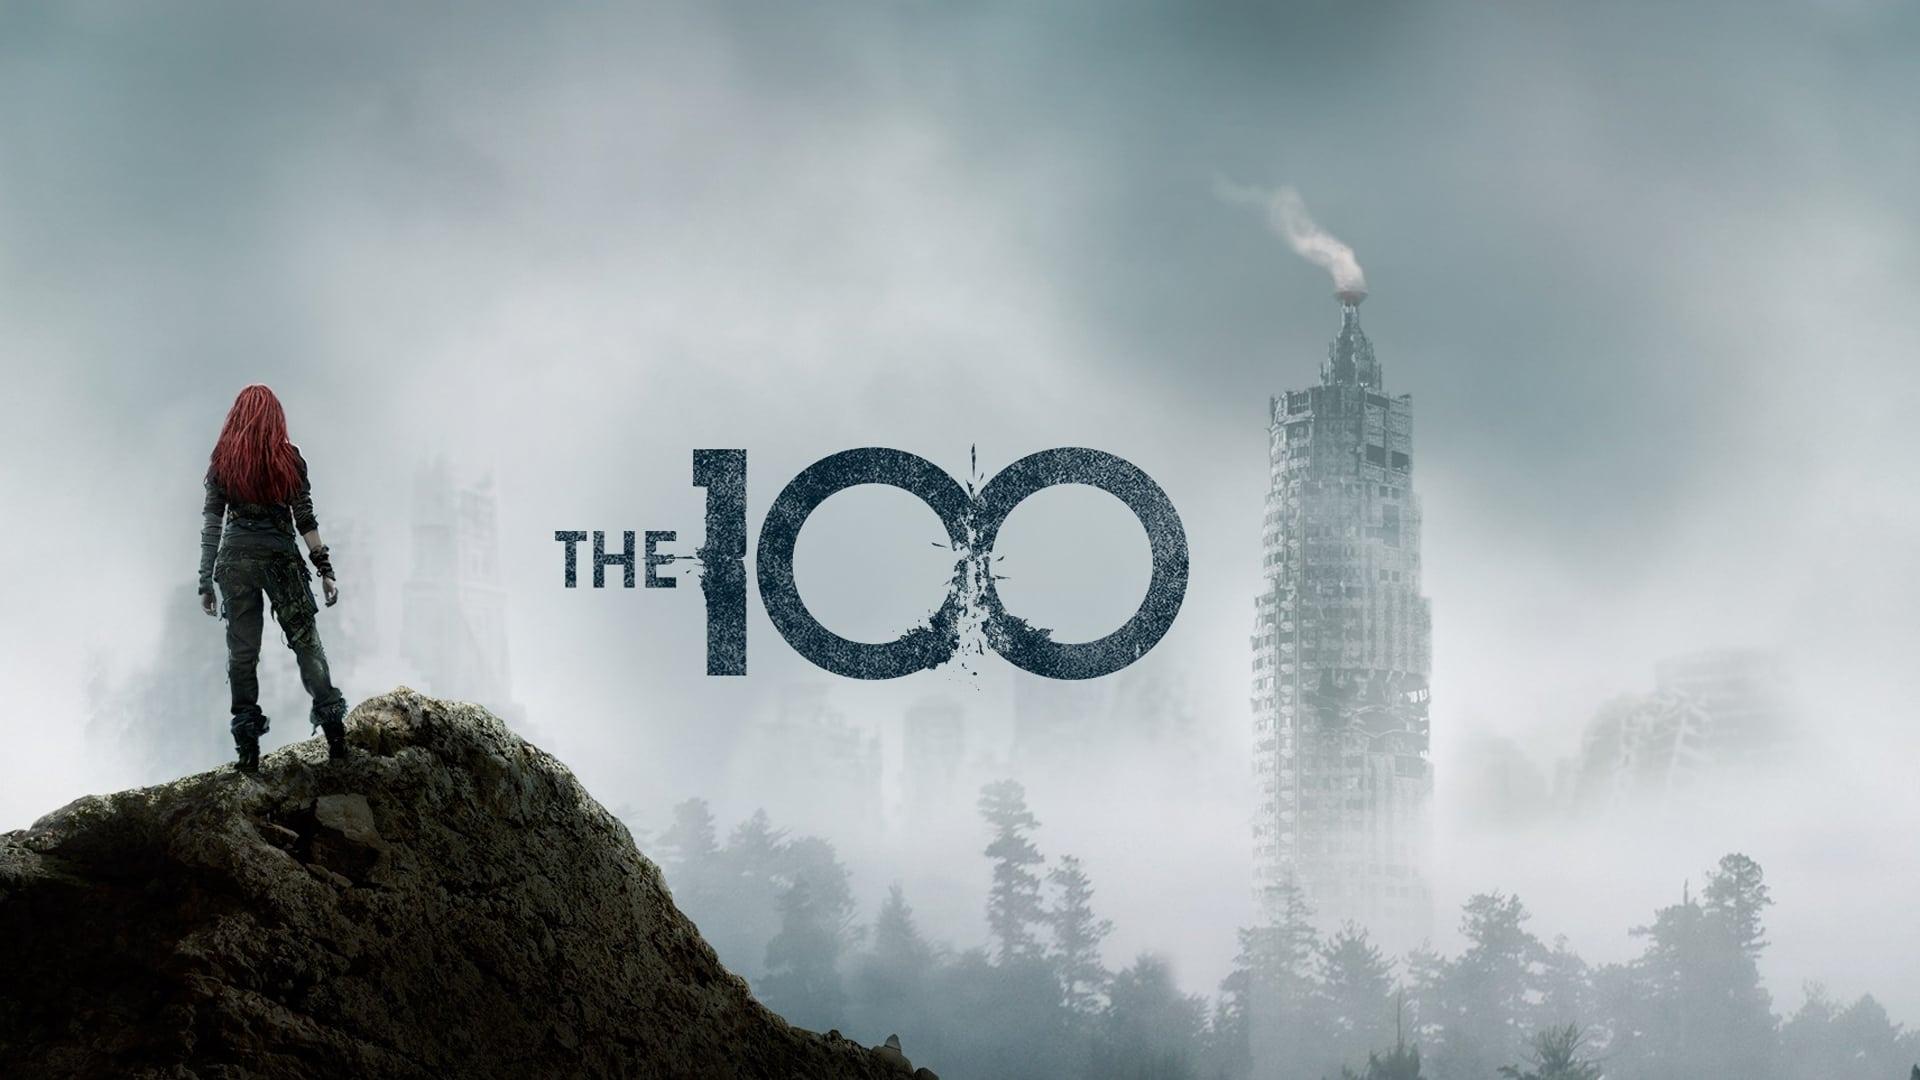 The 100 - Season 2